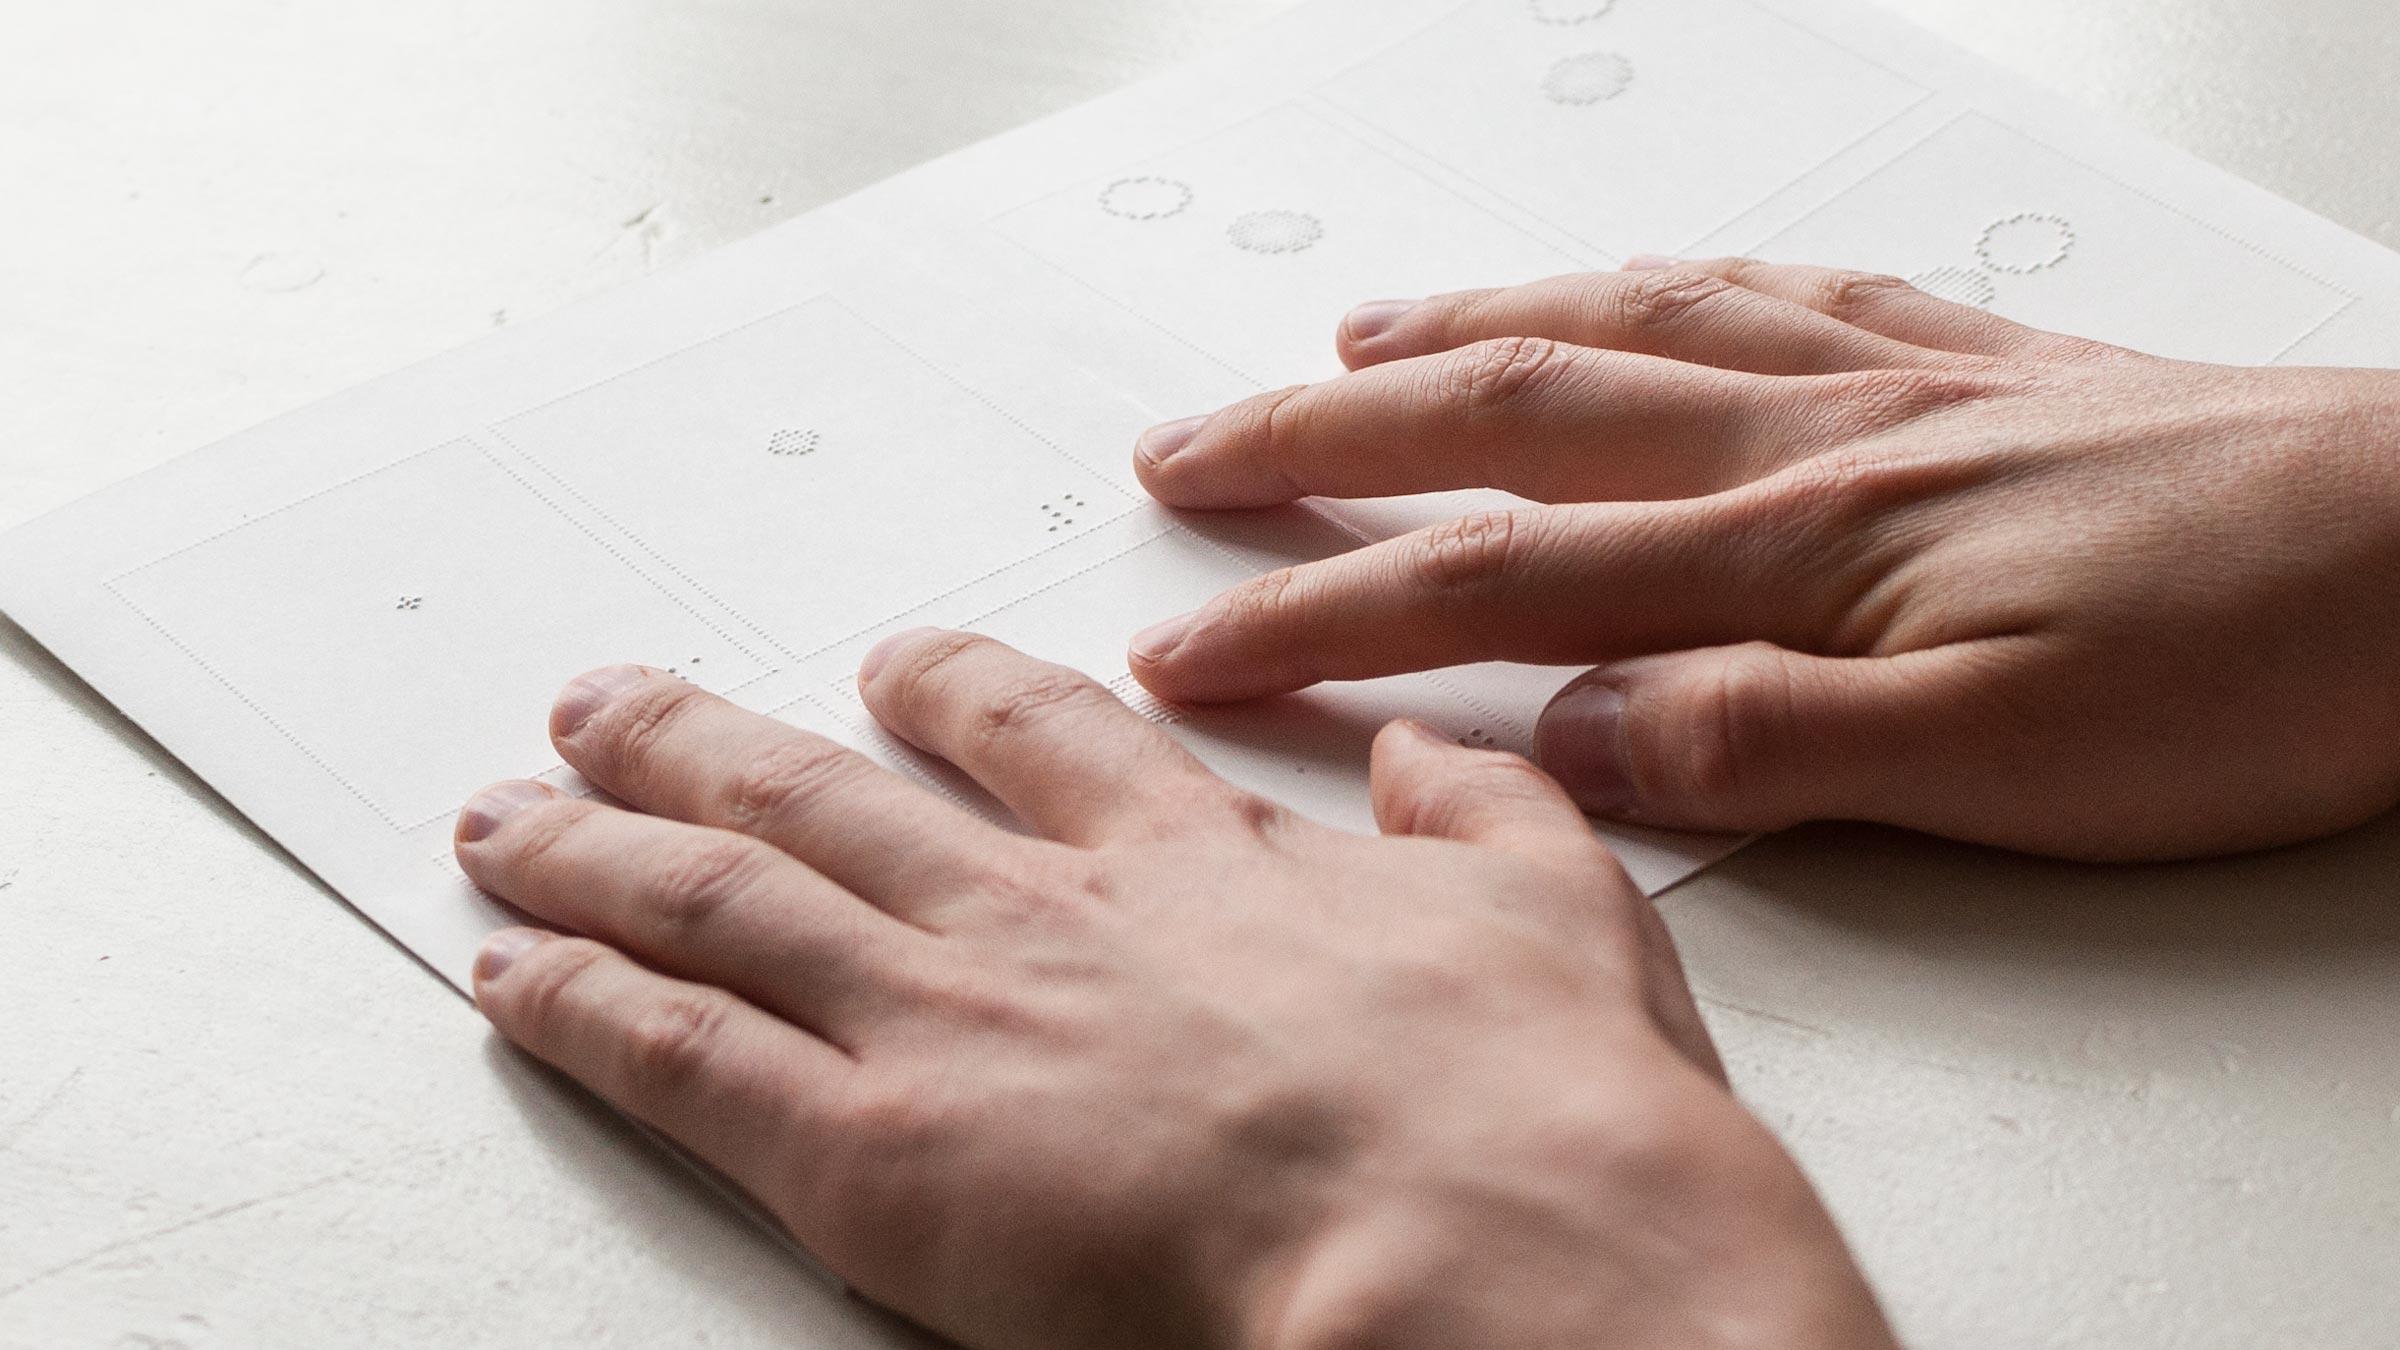 essay on helping blind people